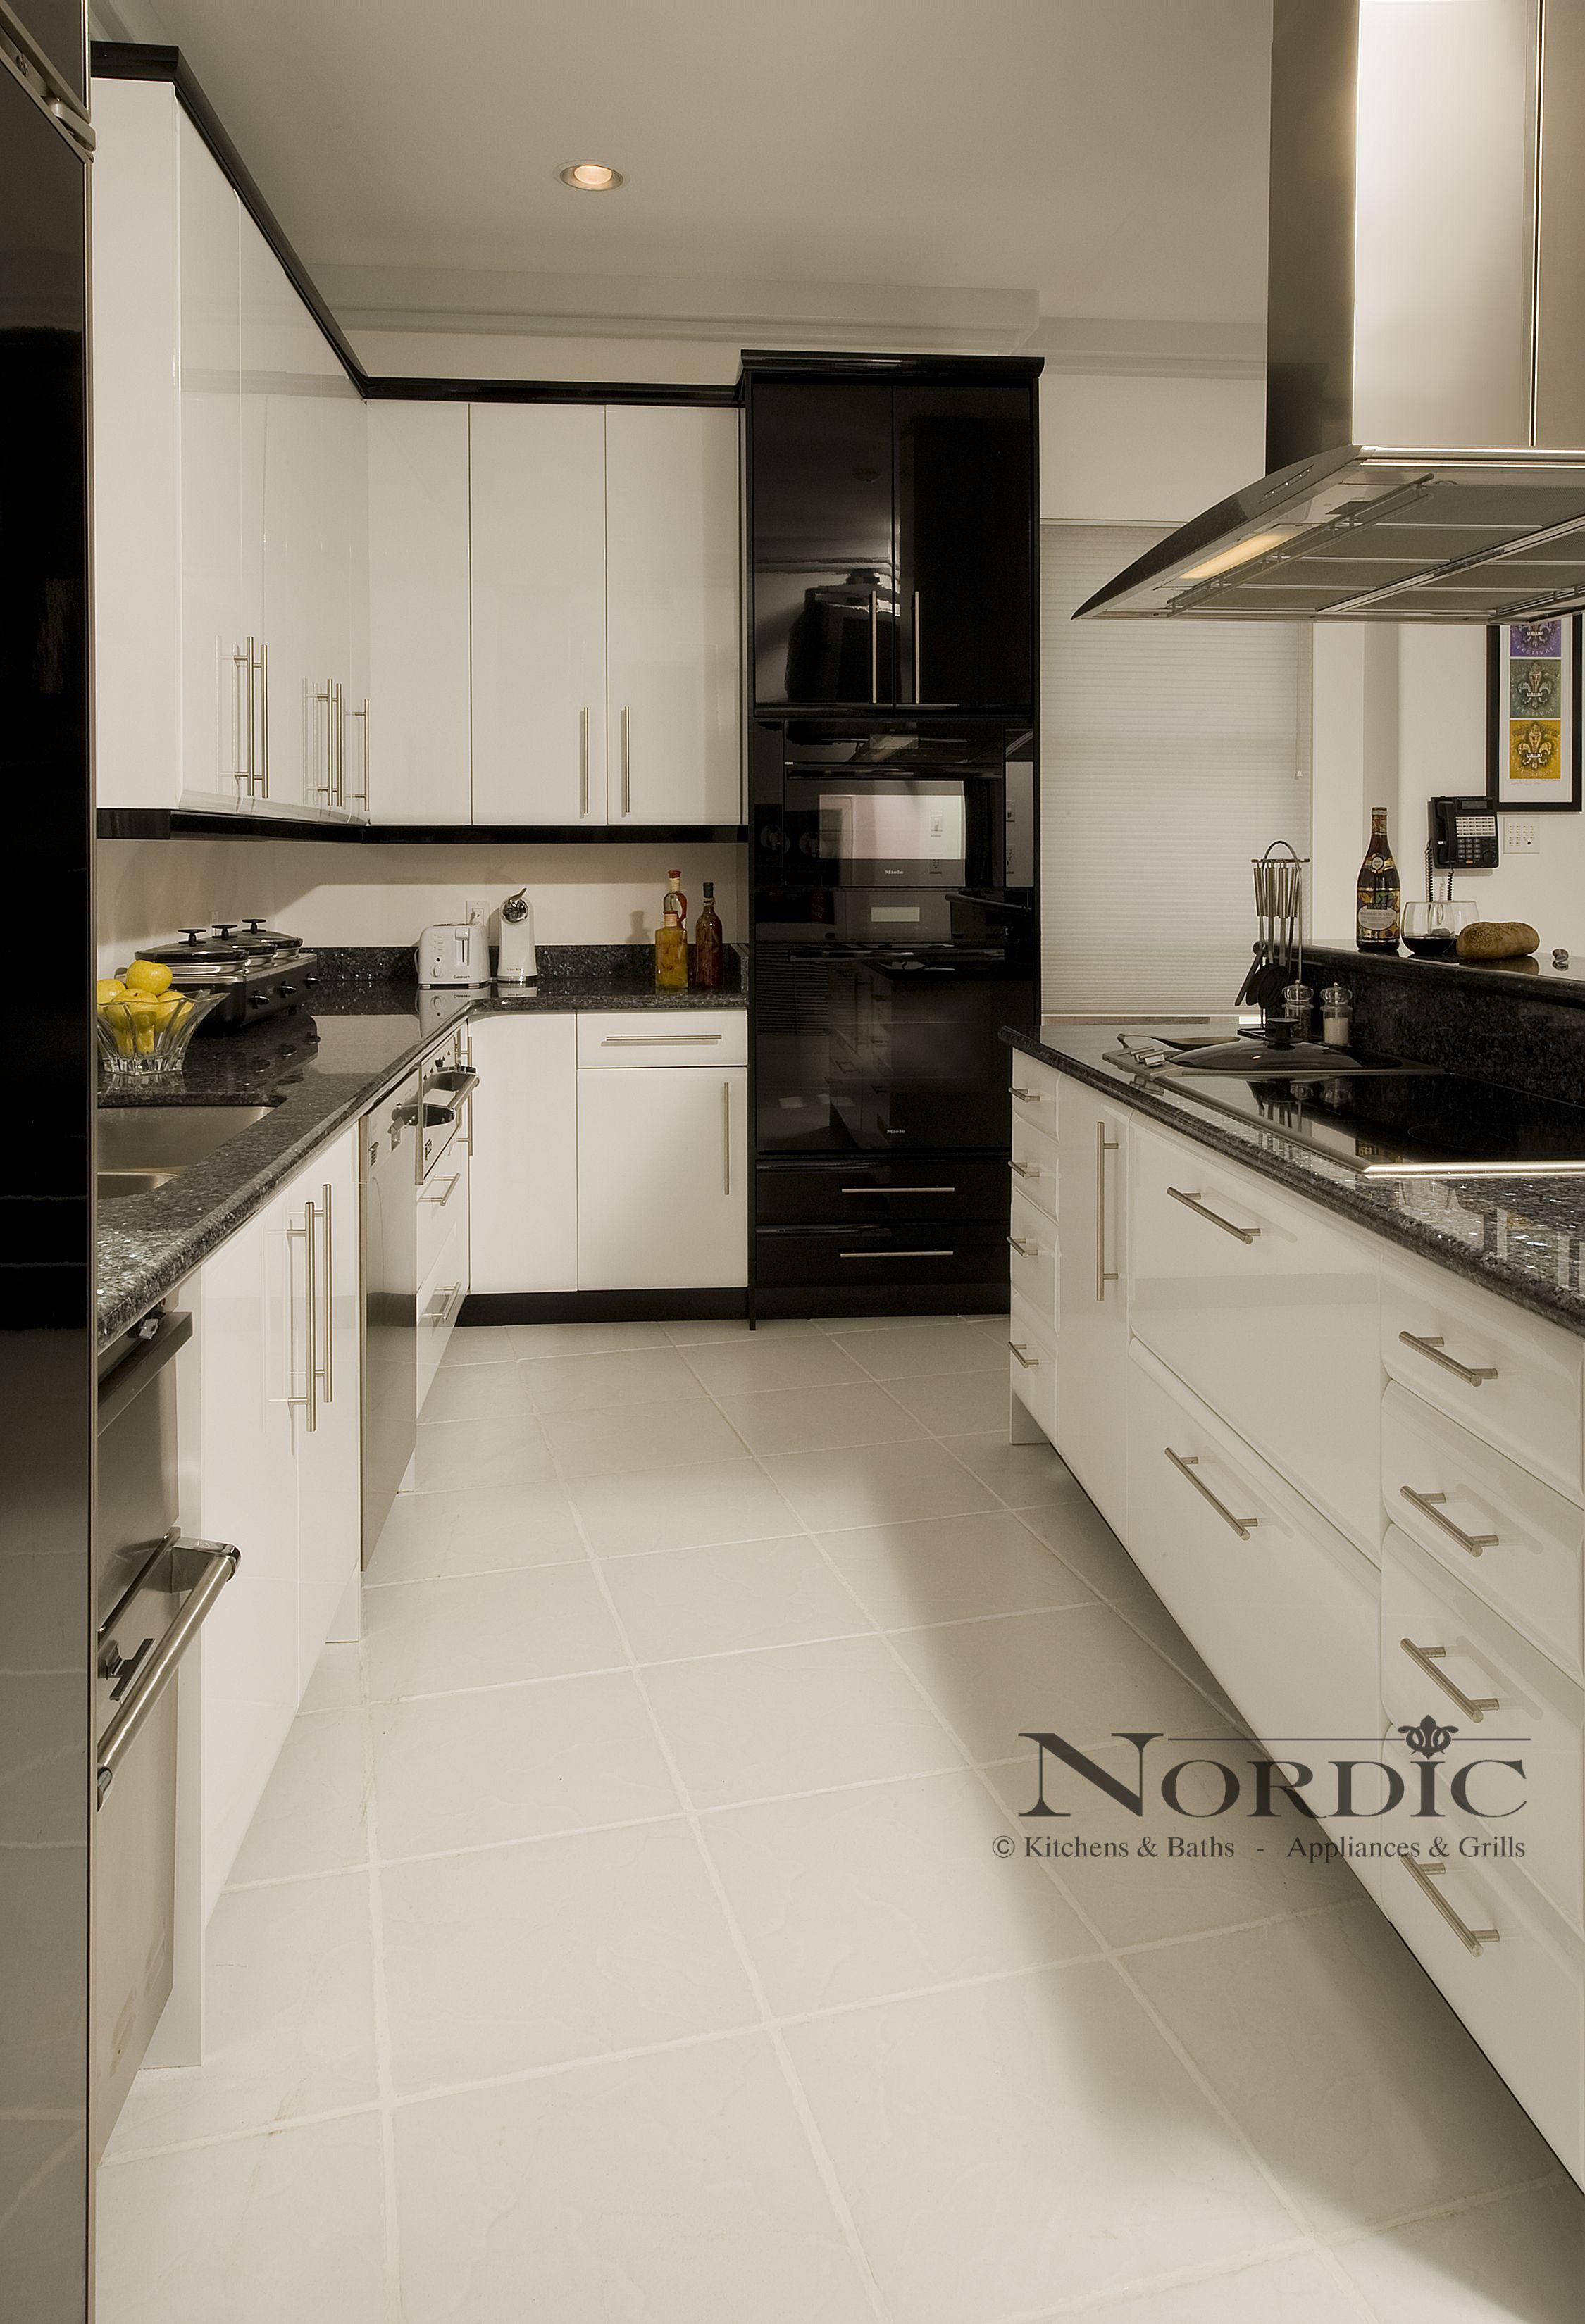 Nordic Kitchens And Baths Inc Metairie Lousisiana Contemporary Kitchen Nordic Kitchen Kitchen And Bath